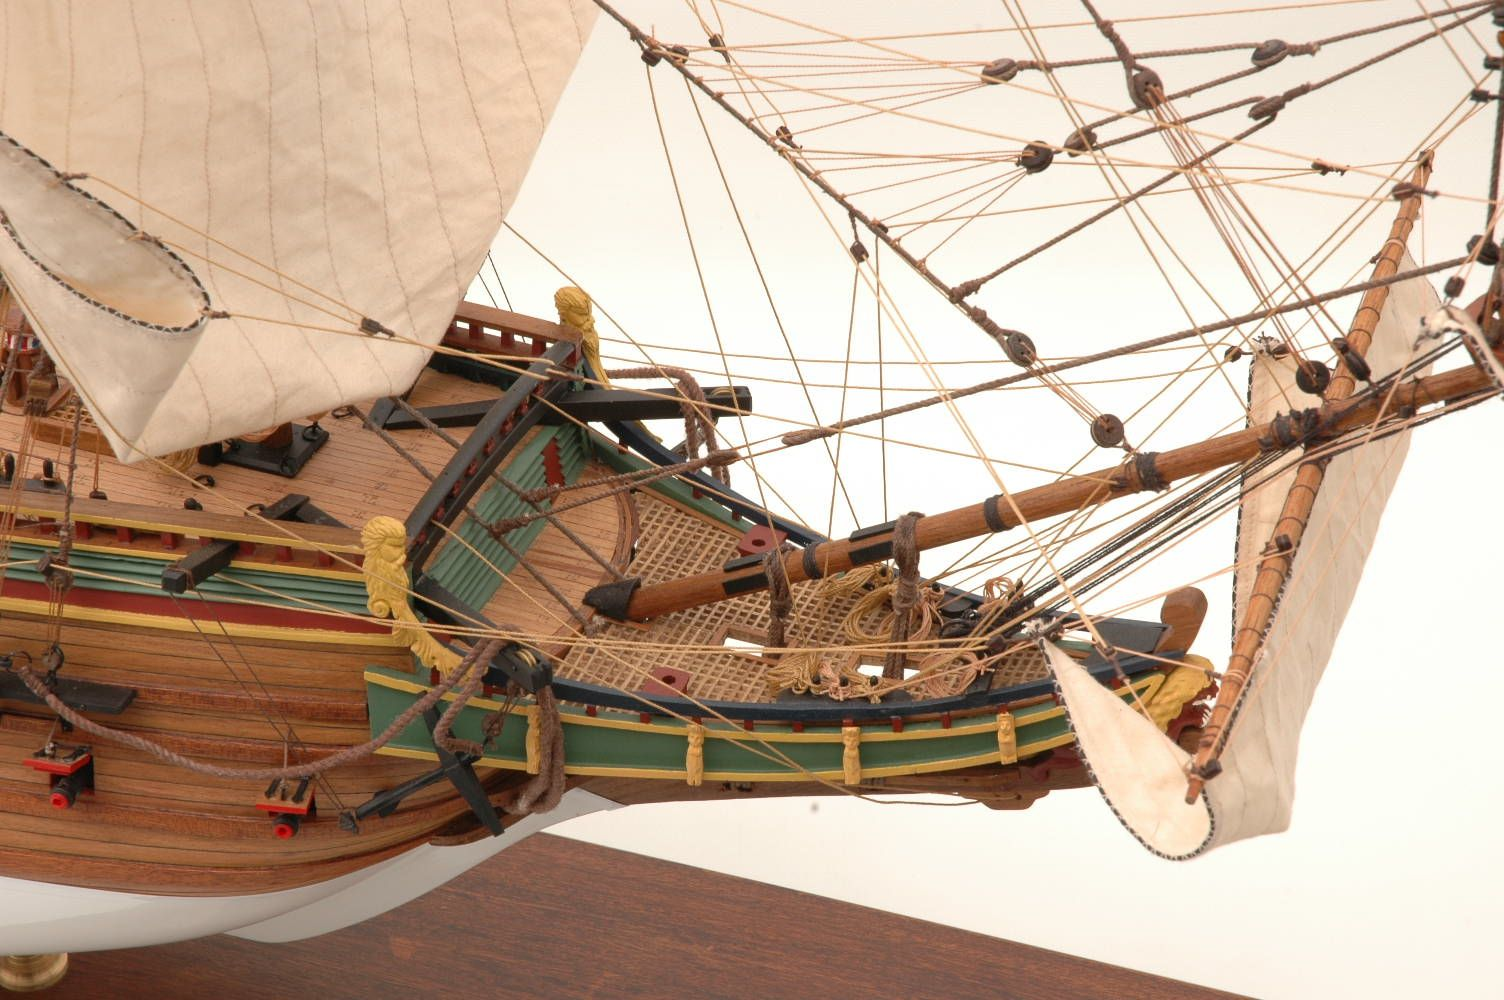 228-6946-Batavia-model-ship-Premier-Range